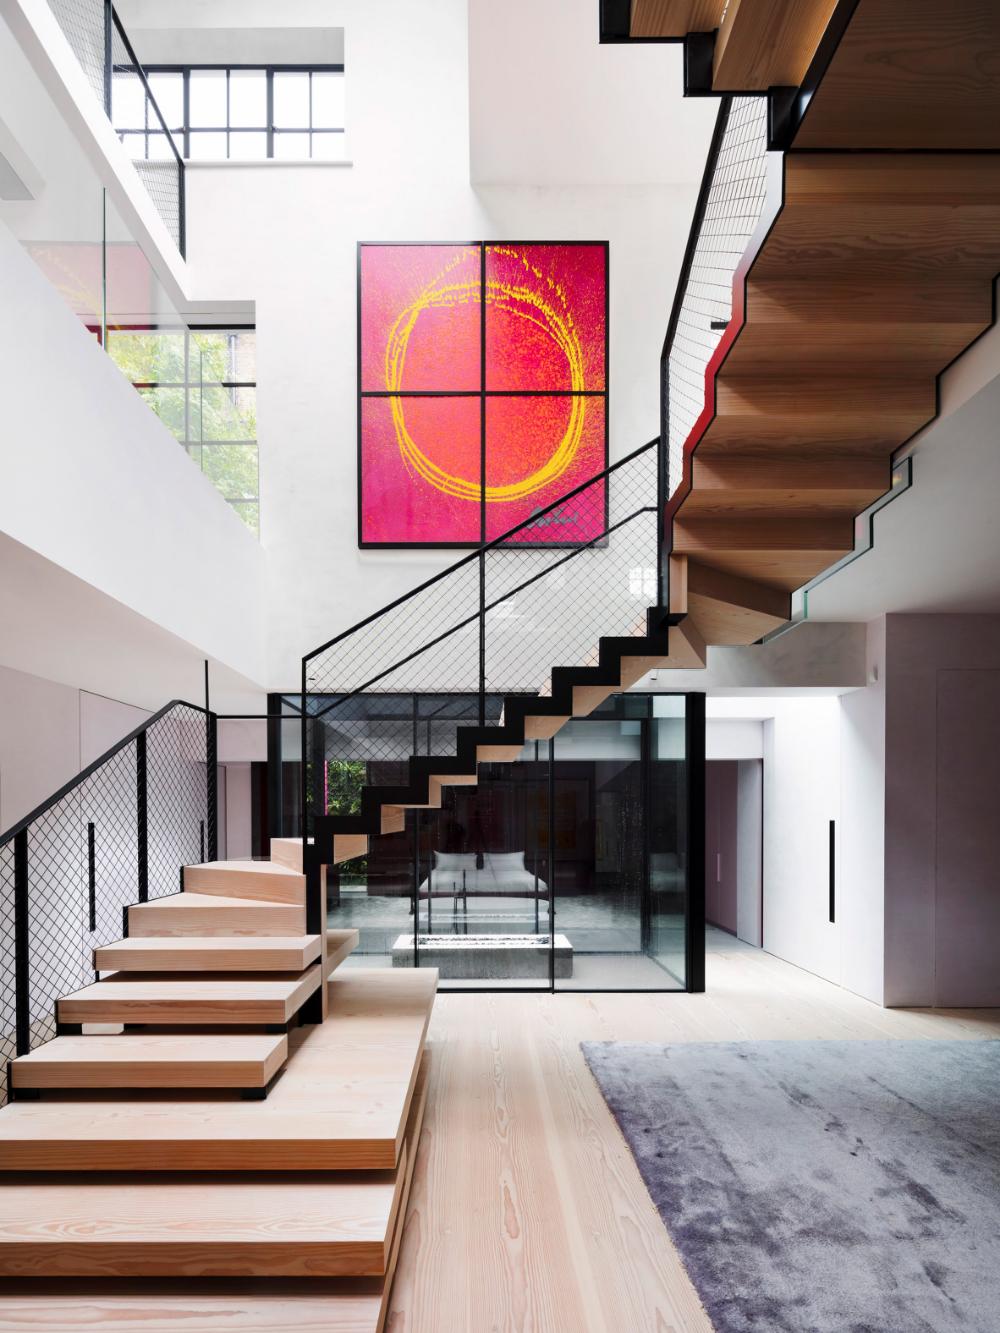 Rodić Davidson Architects converts art studios into